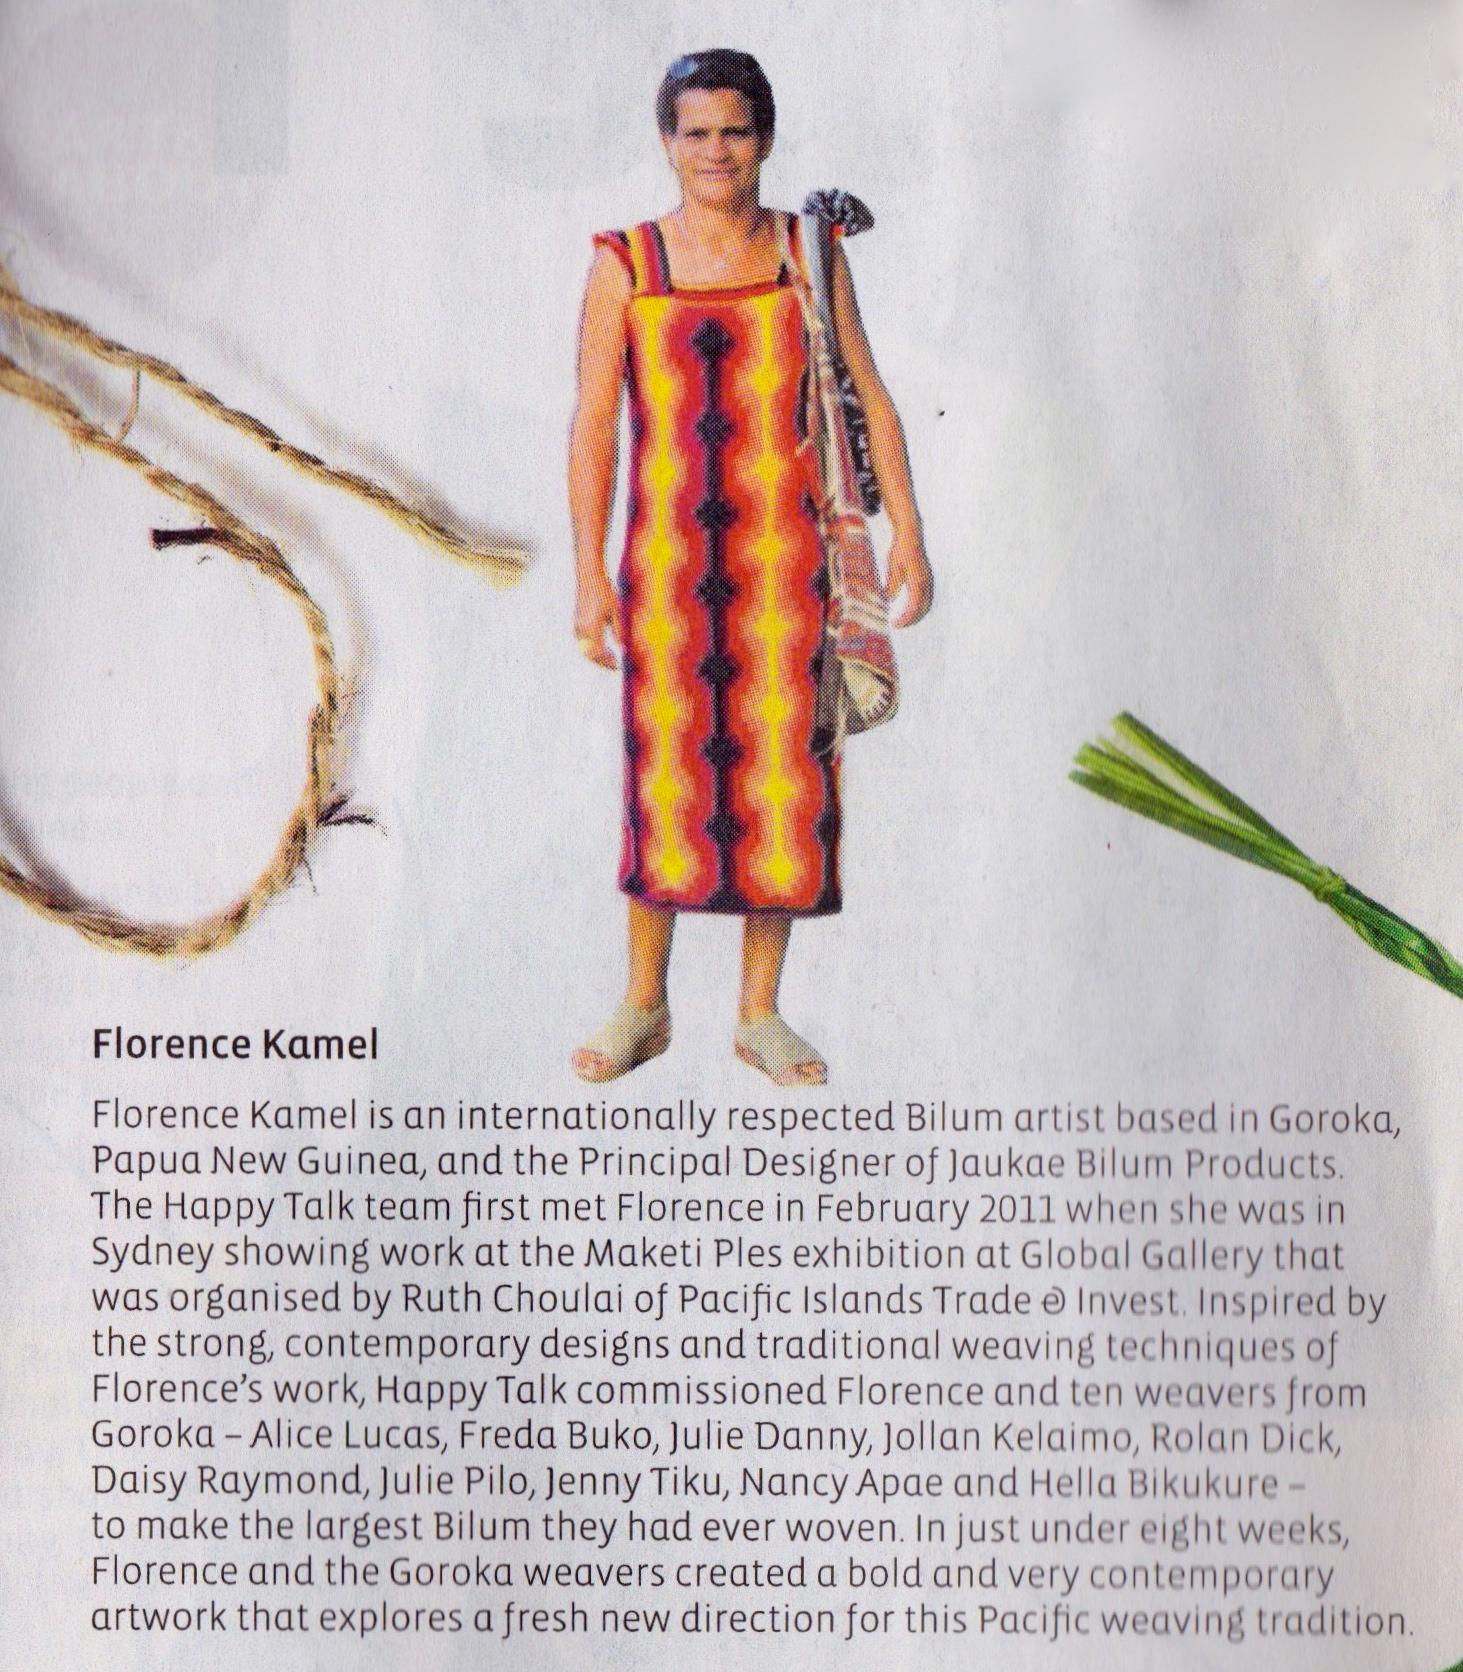 Florence Kamel in the Kalibobo dress,  Happy Talk  publication 2011.